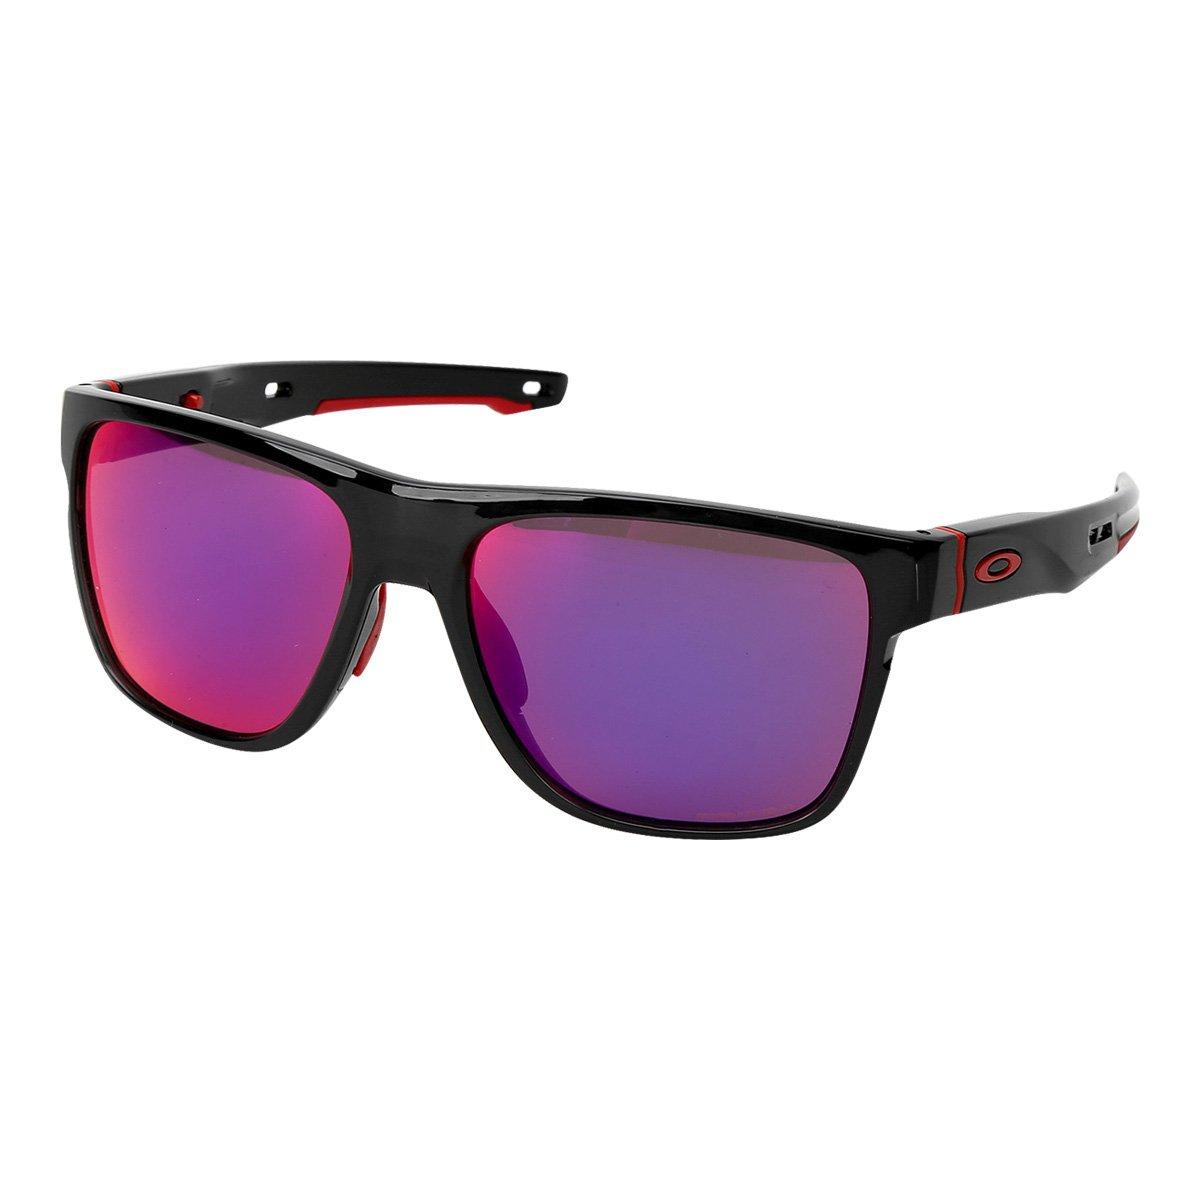 d98b4aa85 Óculos de Sol Oakley Crossrange Xl Masculino | Netshoes